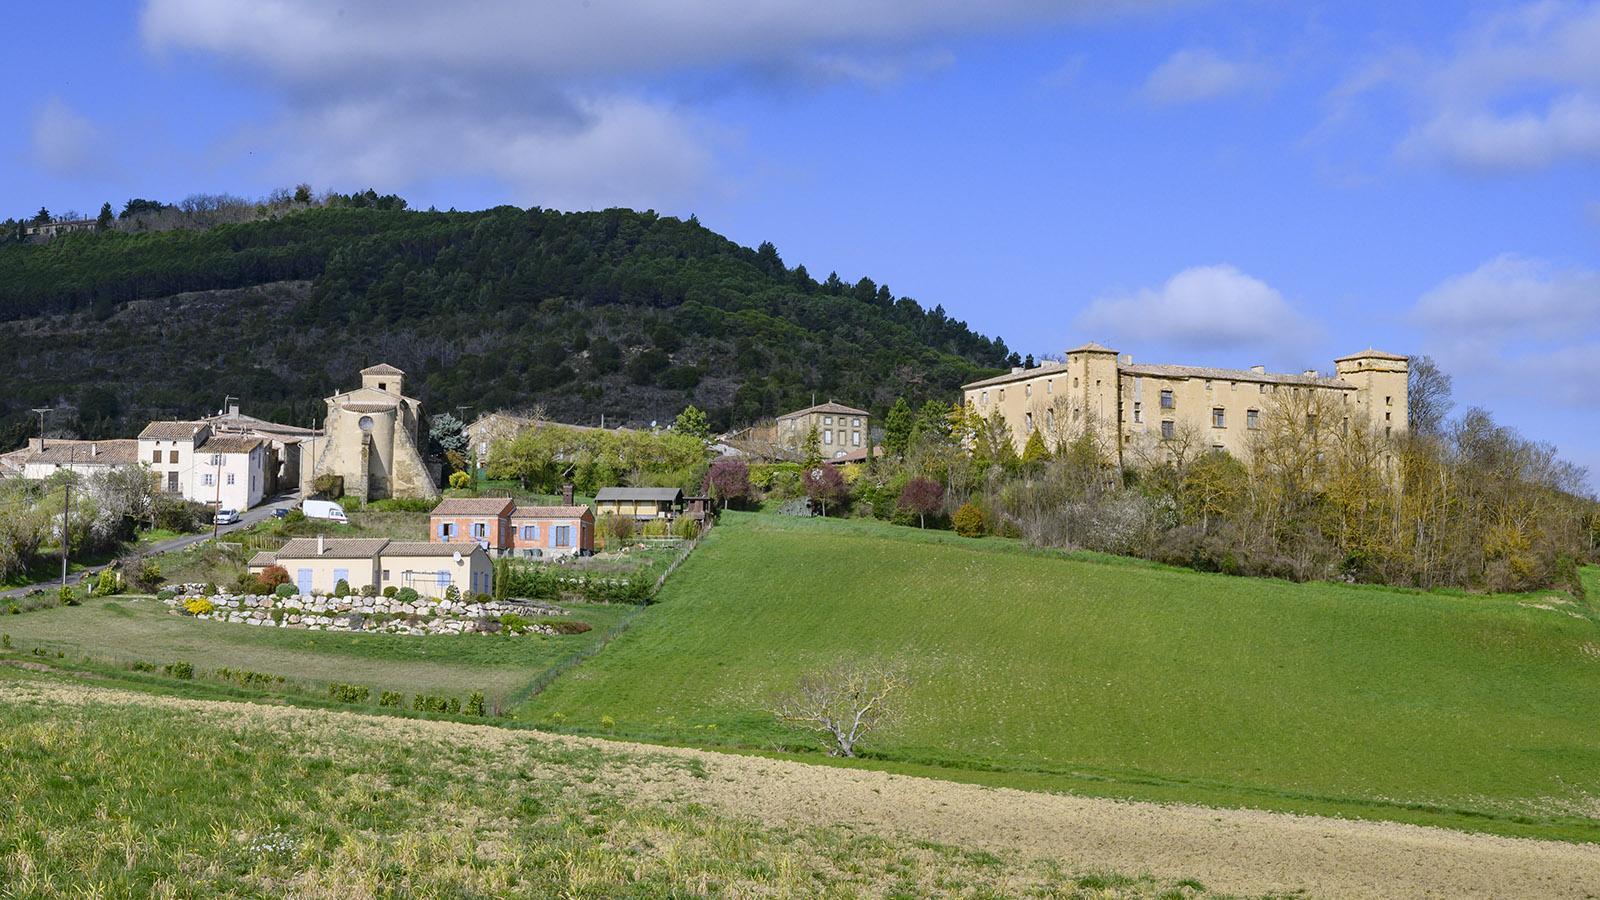 La Serpent mit Schloss und Église Saint-Étienne. Foto: Hilke Maunder